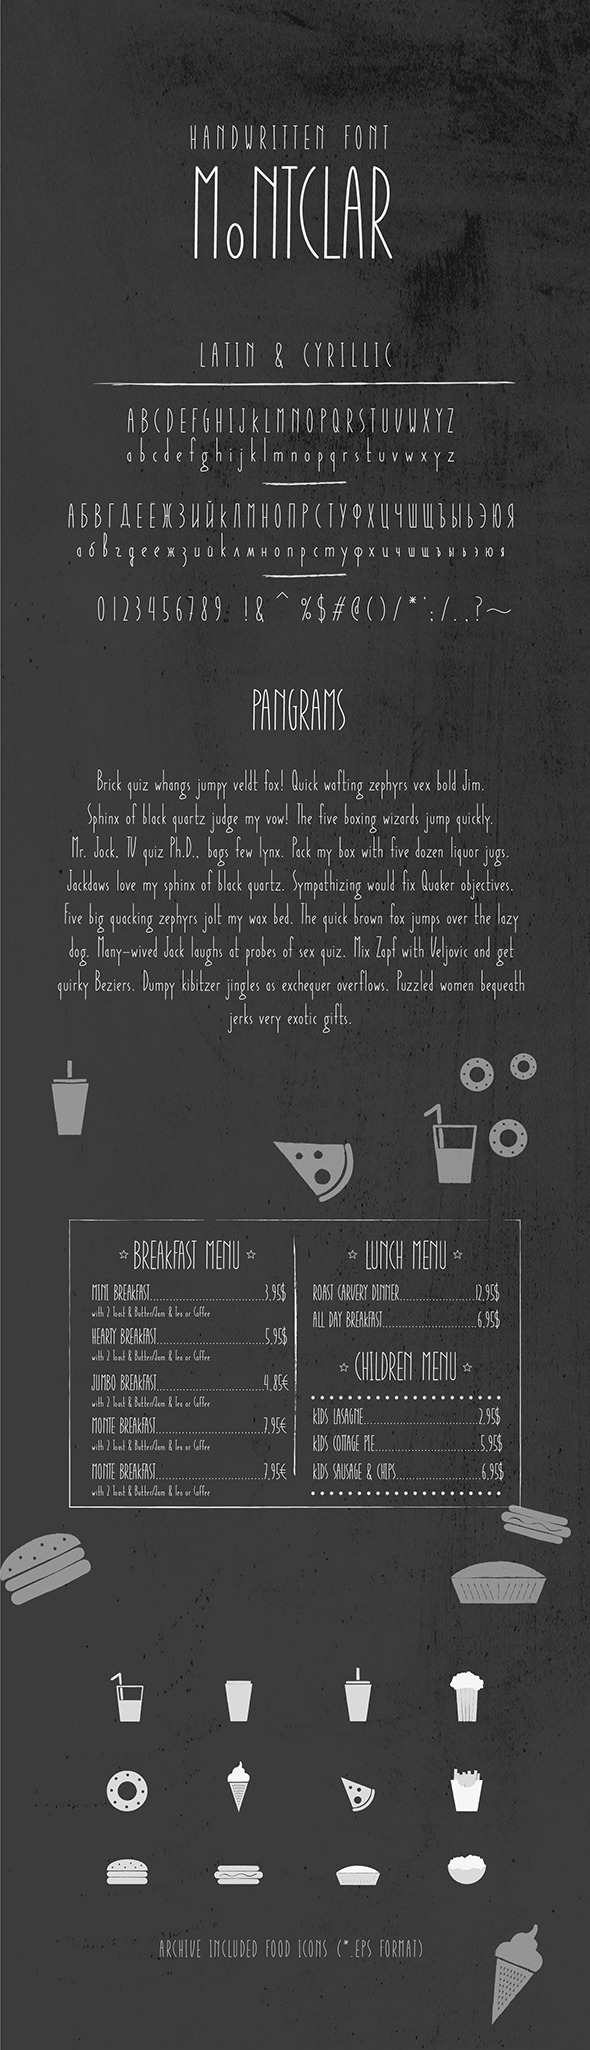 Montclar Font & Food Icons - Handwriting Fonts